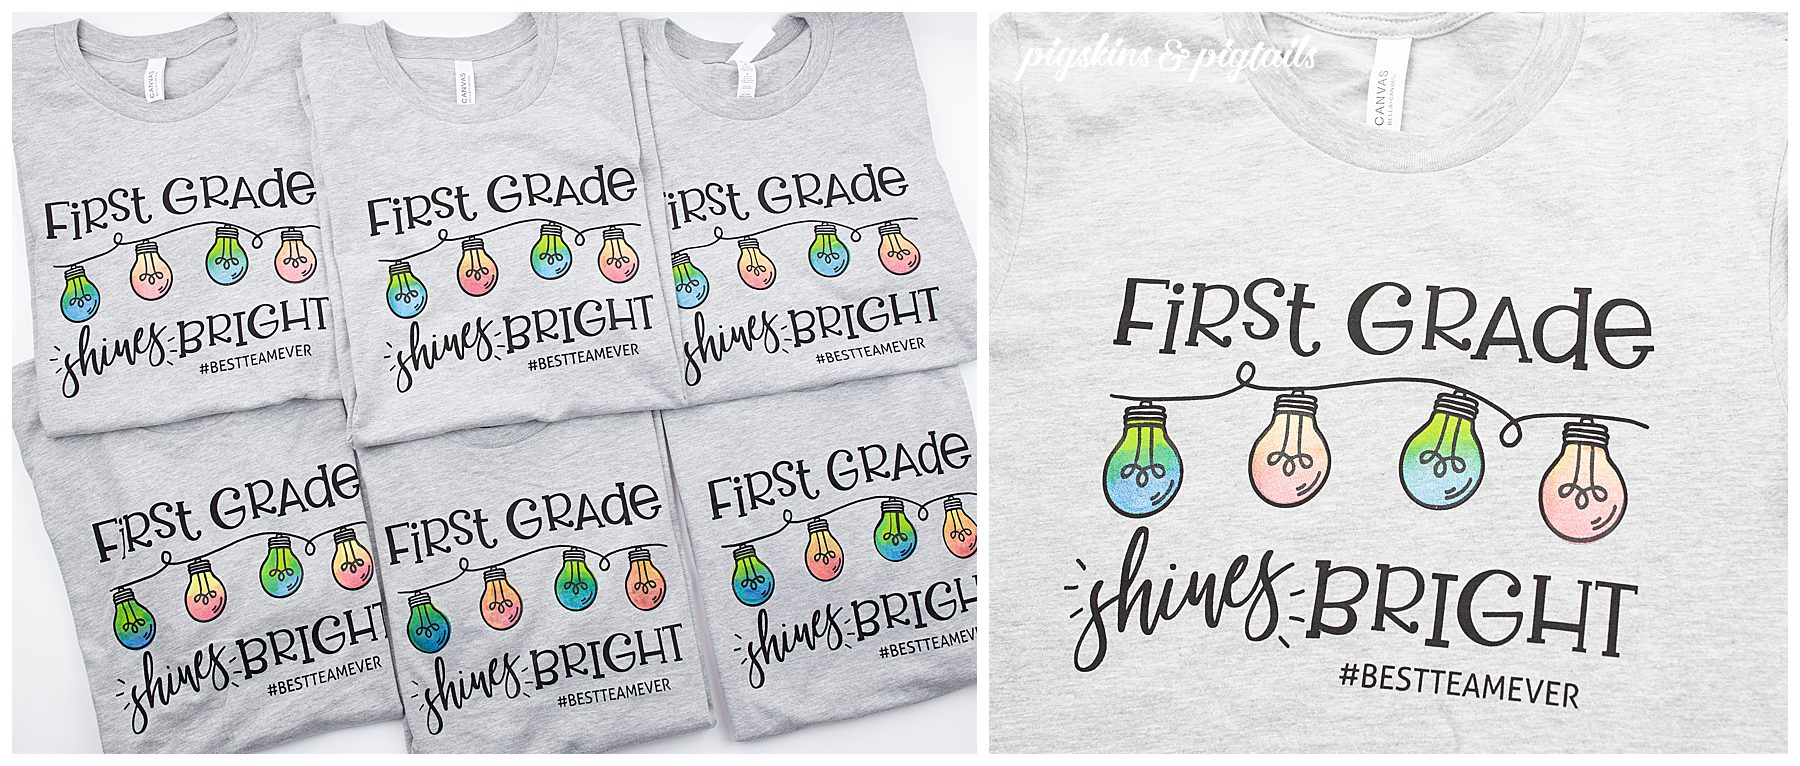 First grade team shirts shine bright light bulbs screen printing vinyl